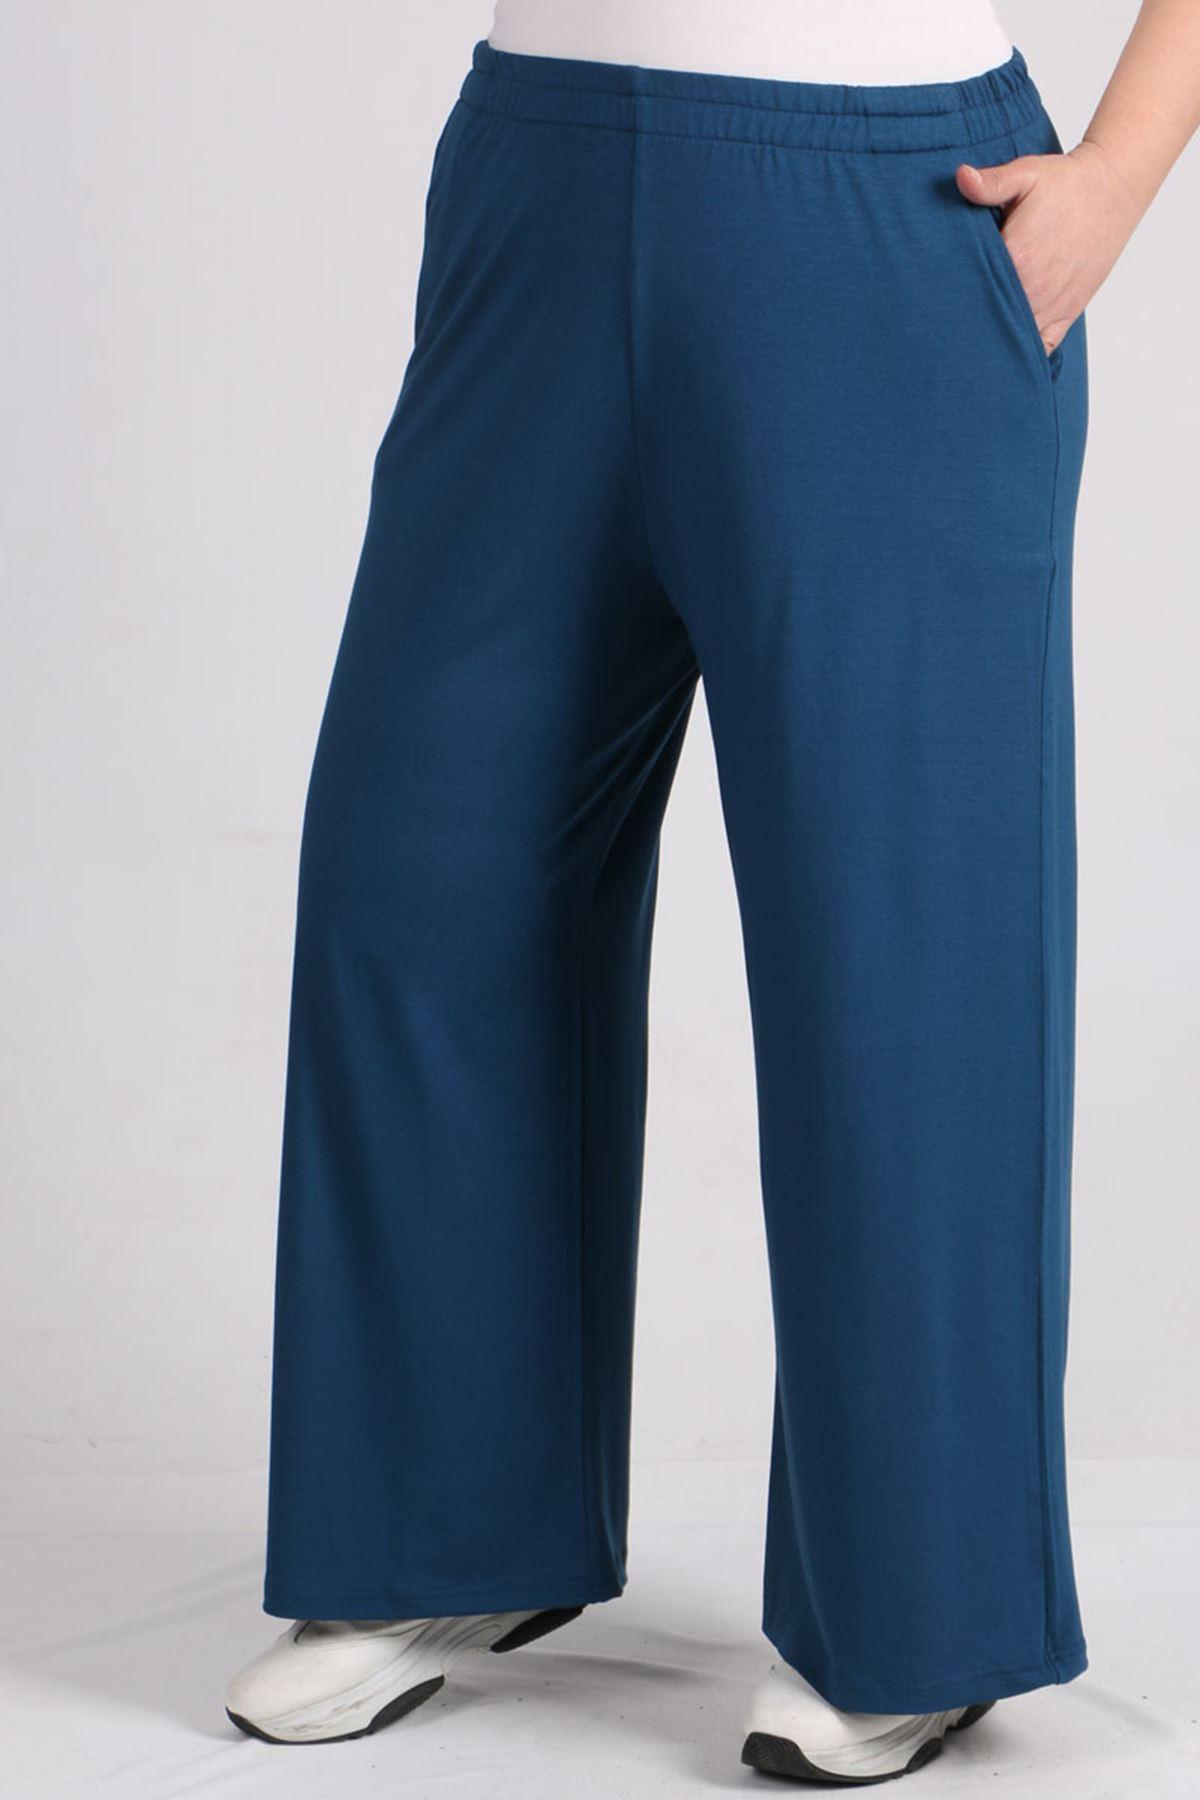 9012 Plus Size Elastic Waist Pants - Petrol